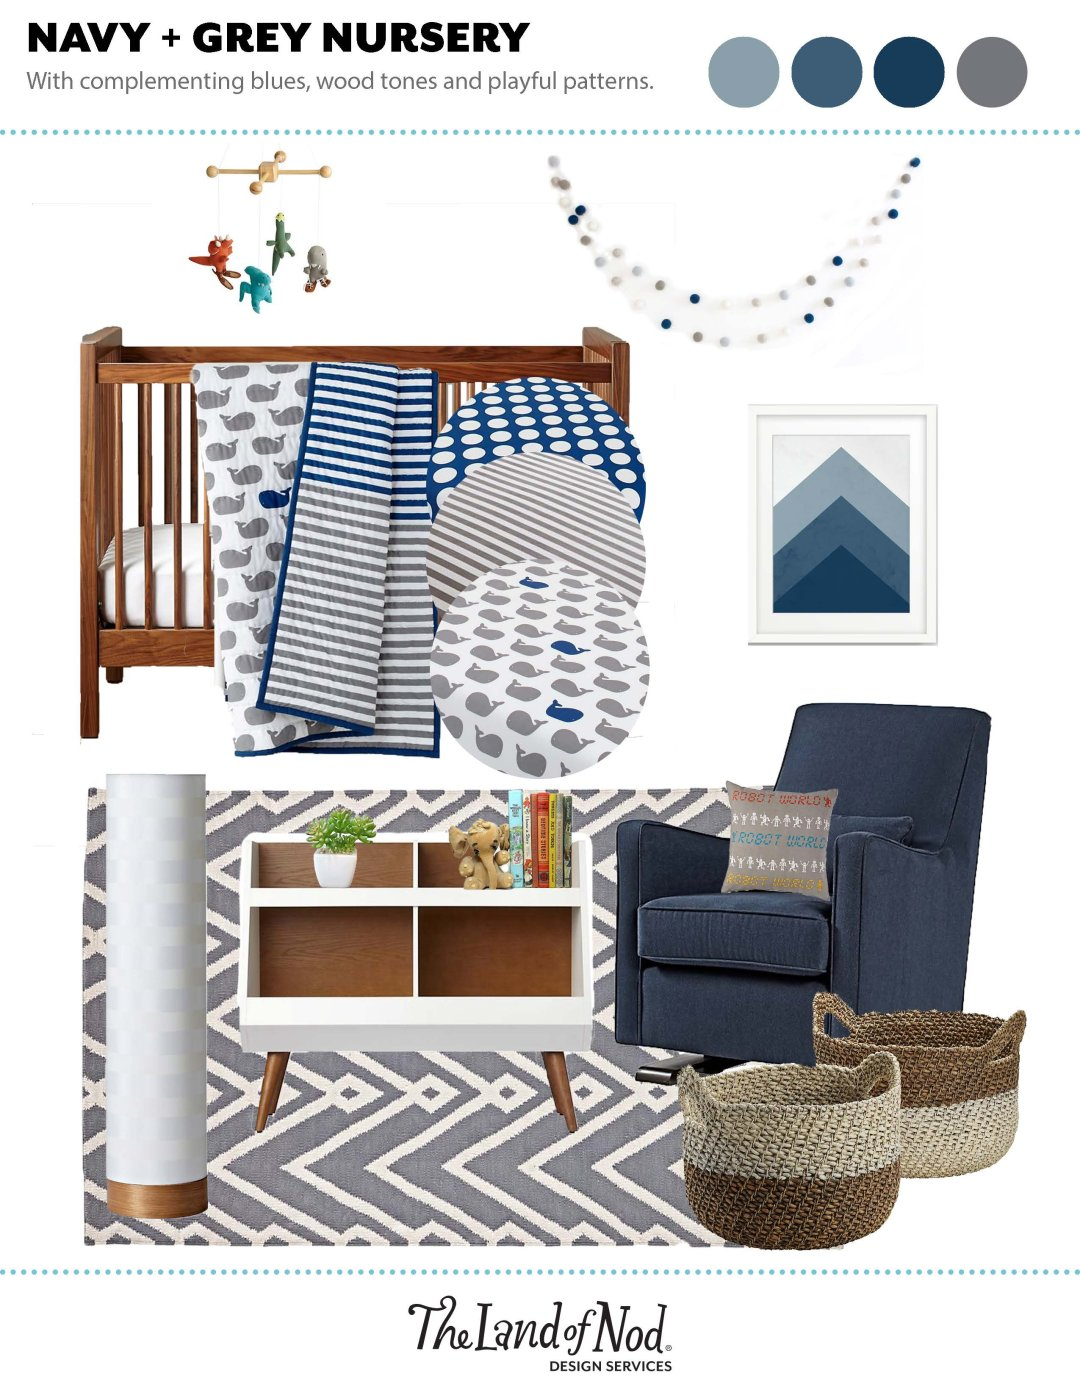 Navy & Grey Nursery Inspiration